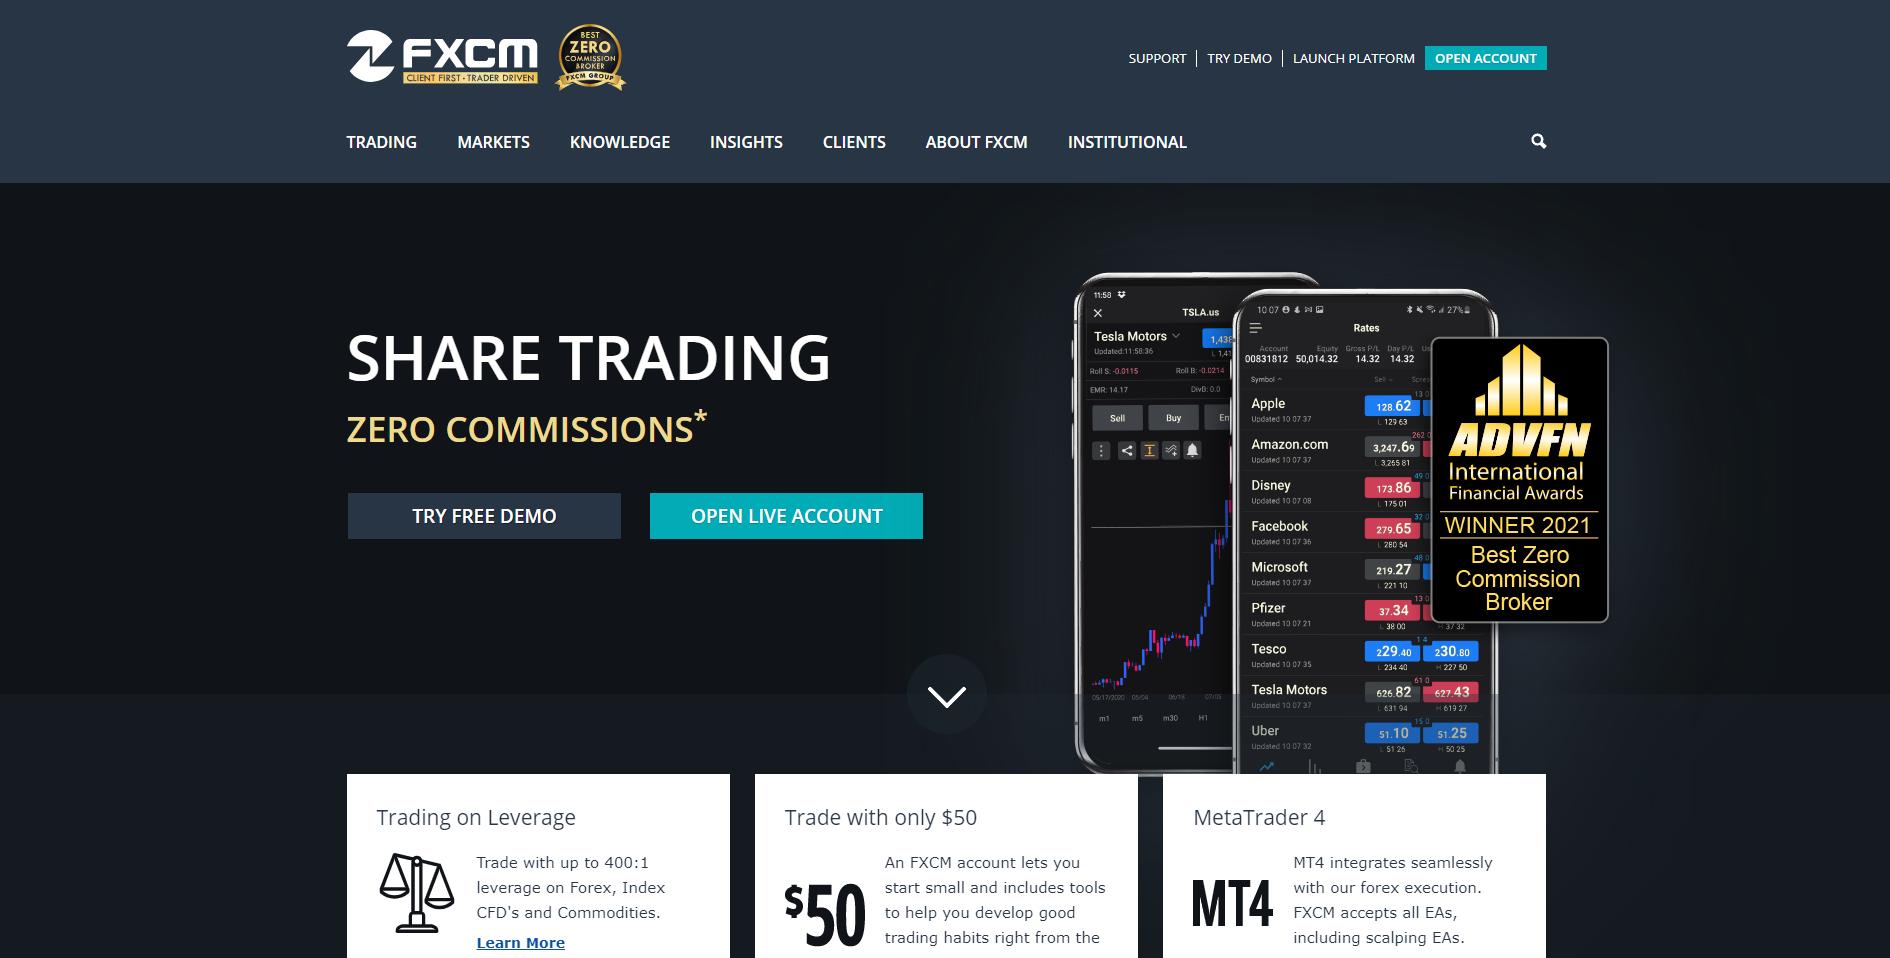 Official website of FXCM